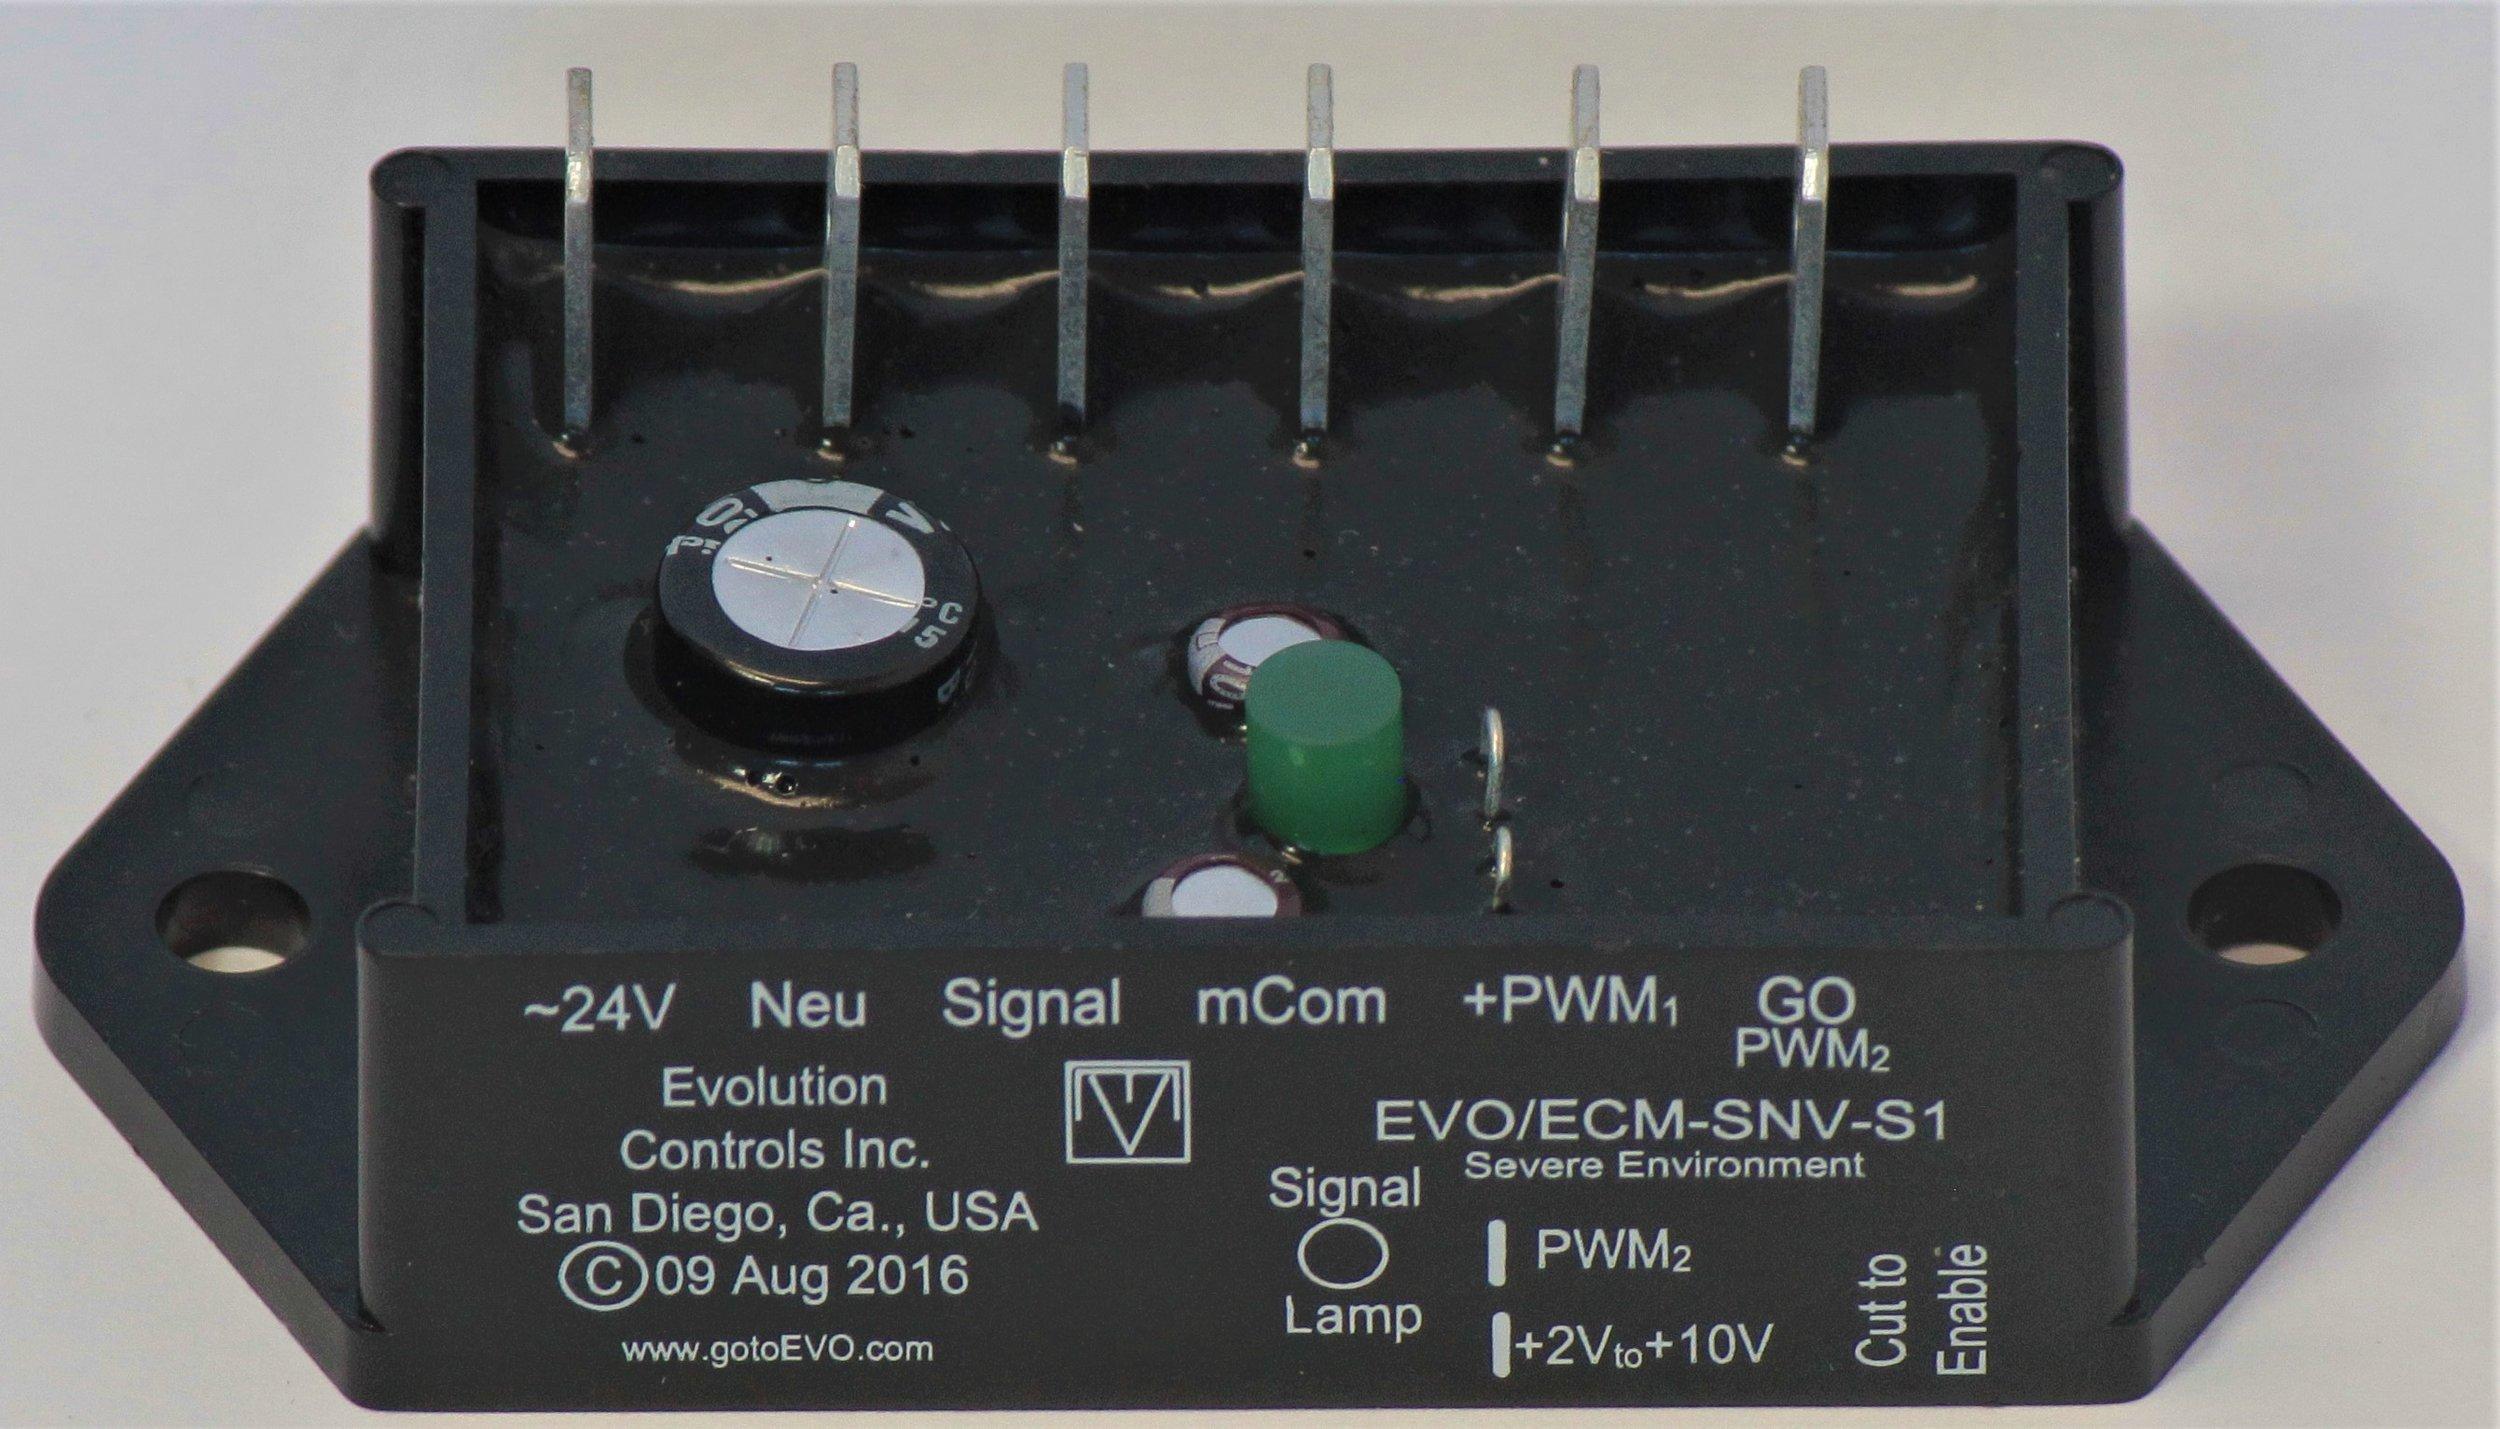 SNV-S1 Front.jpg